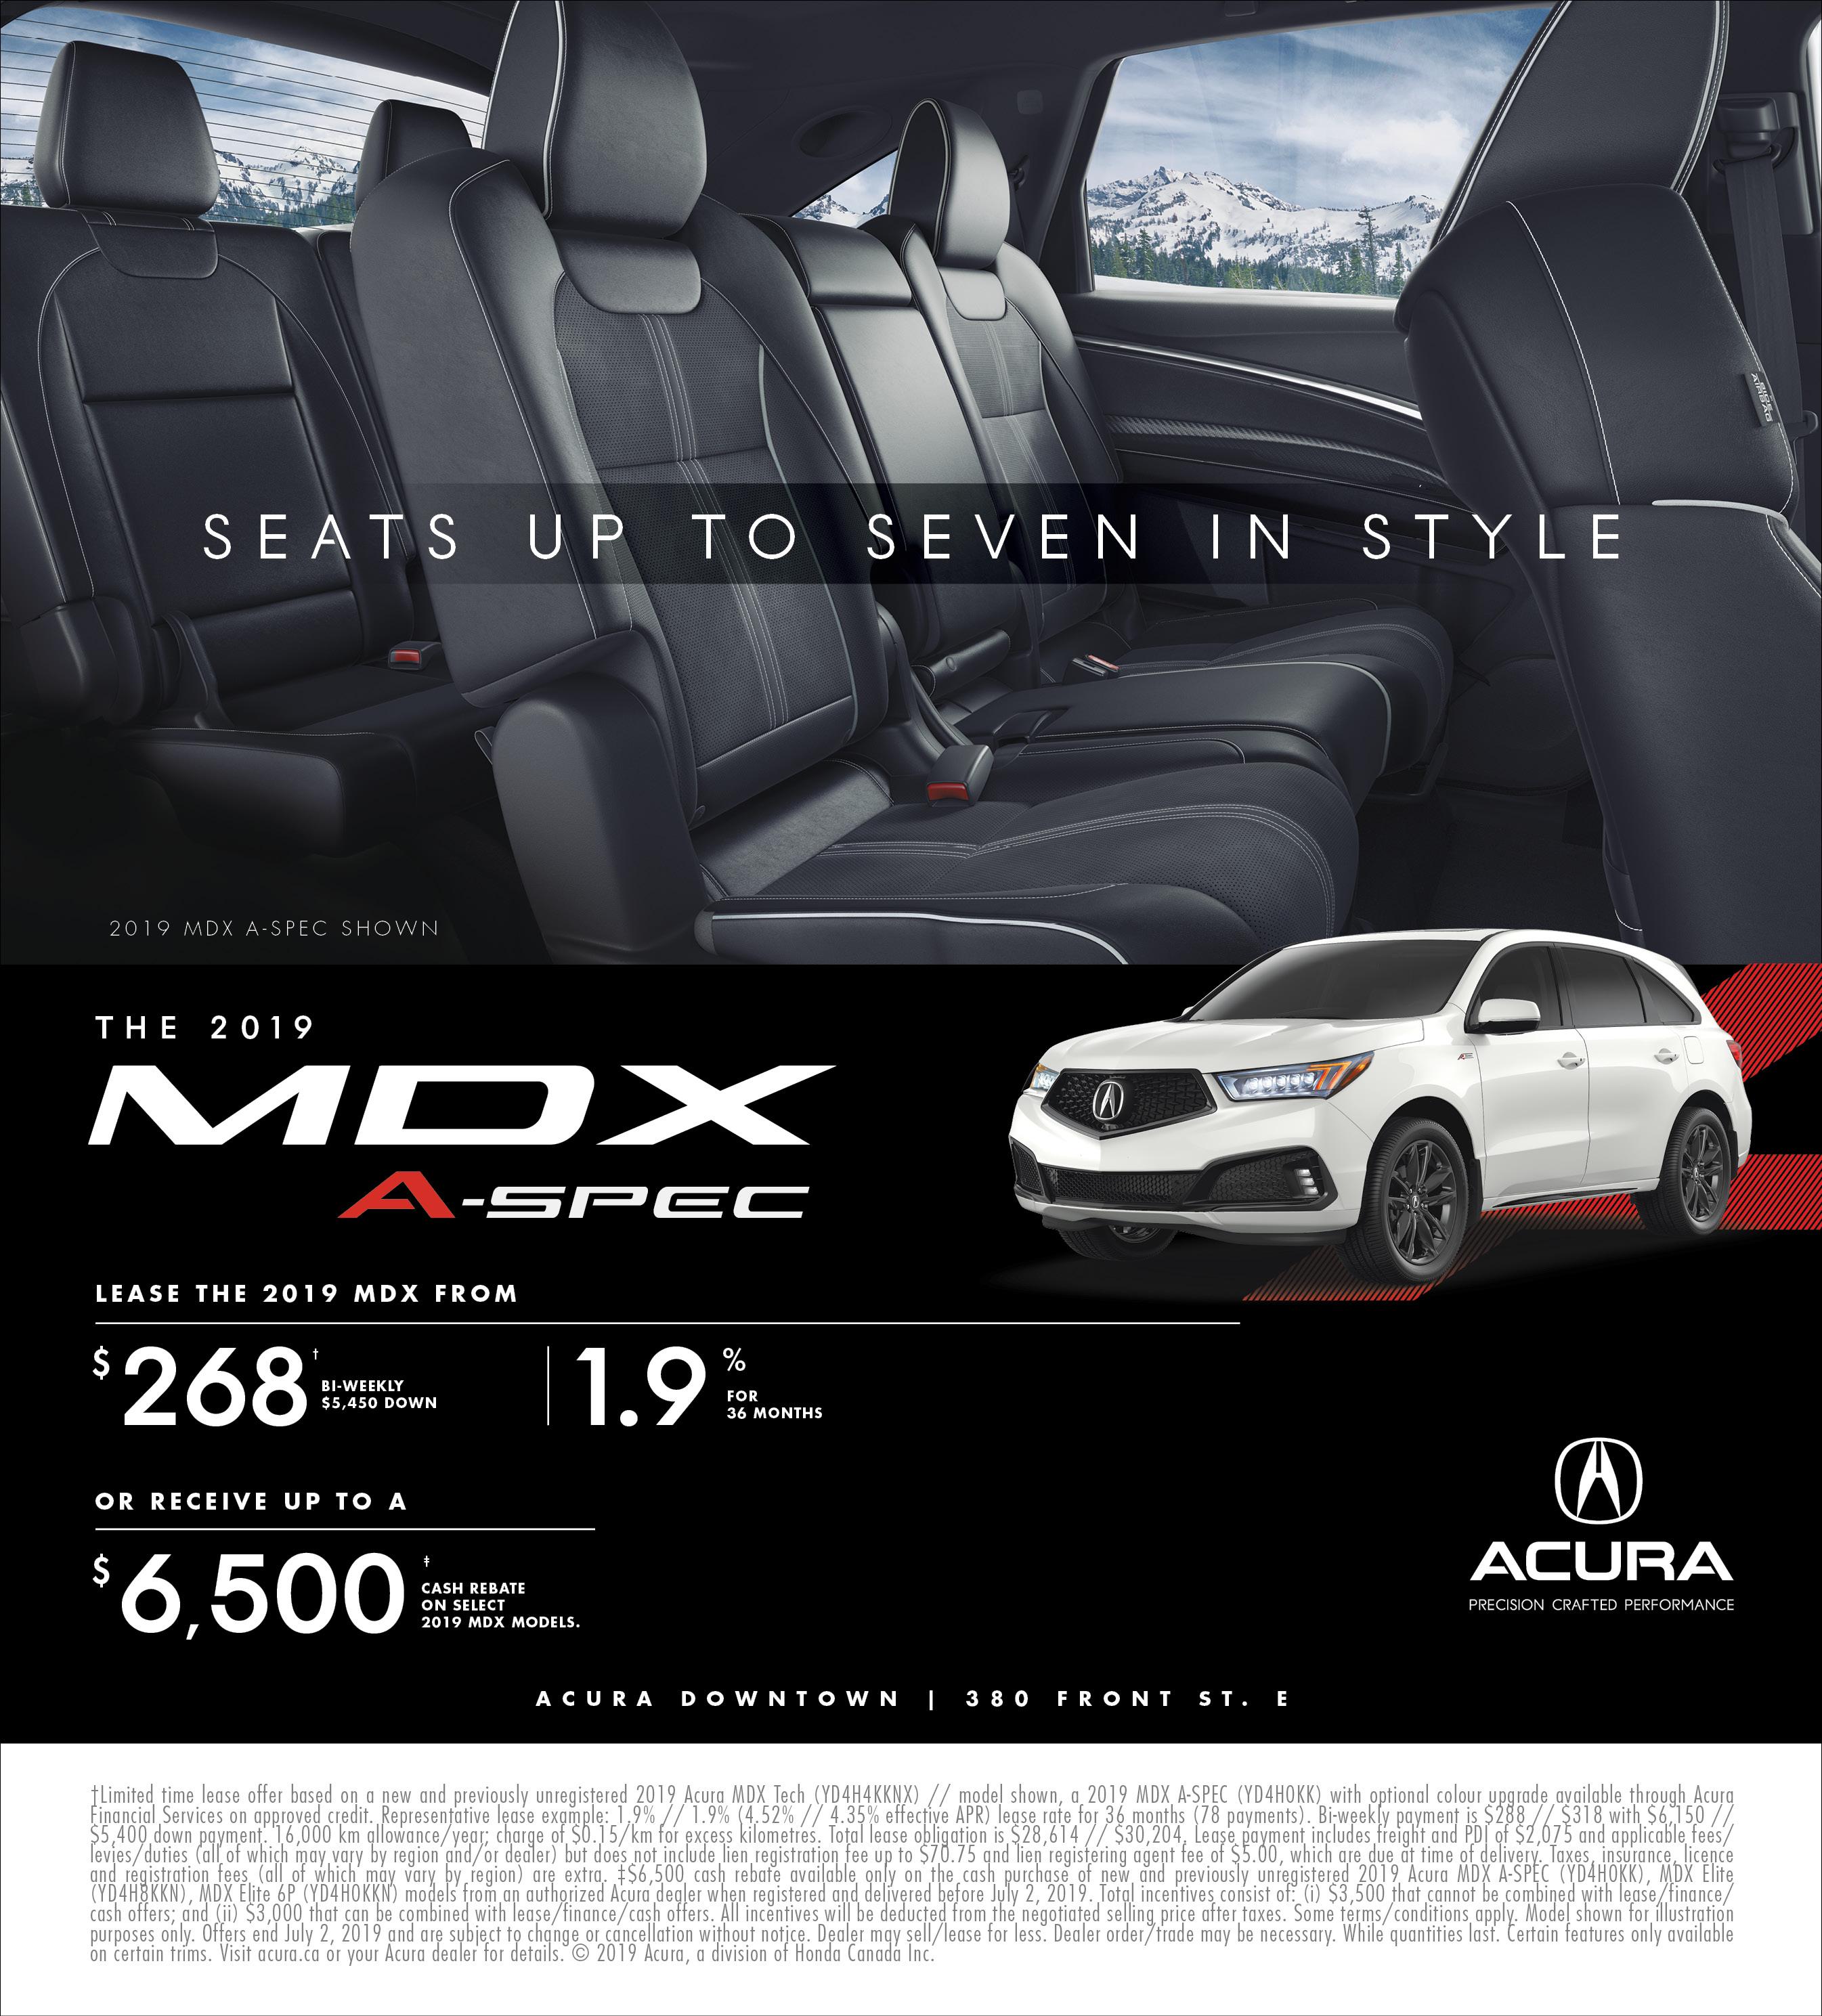 2019 Acura MDX | June